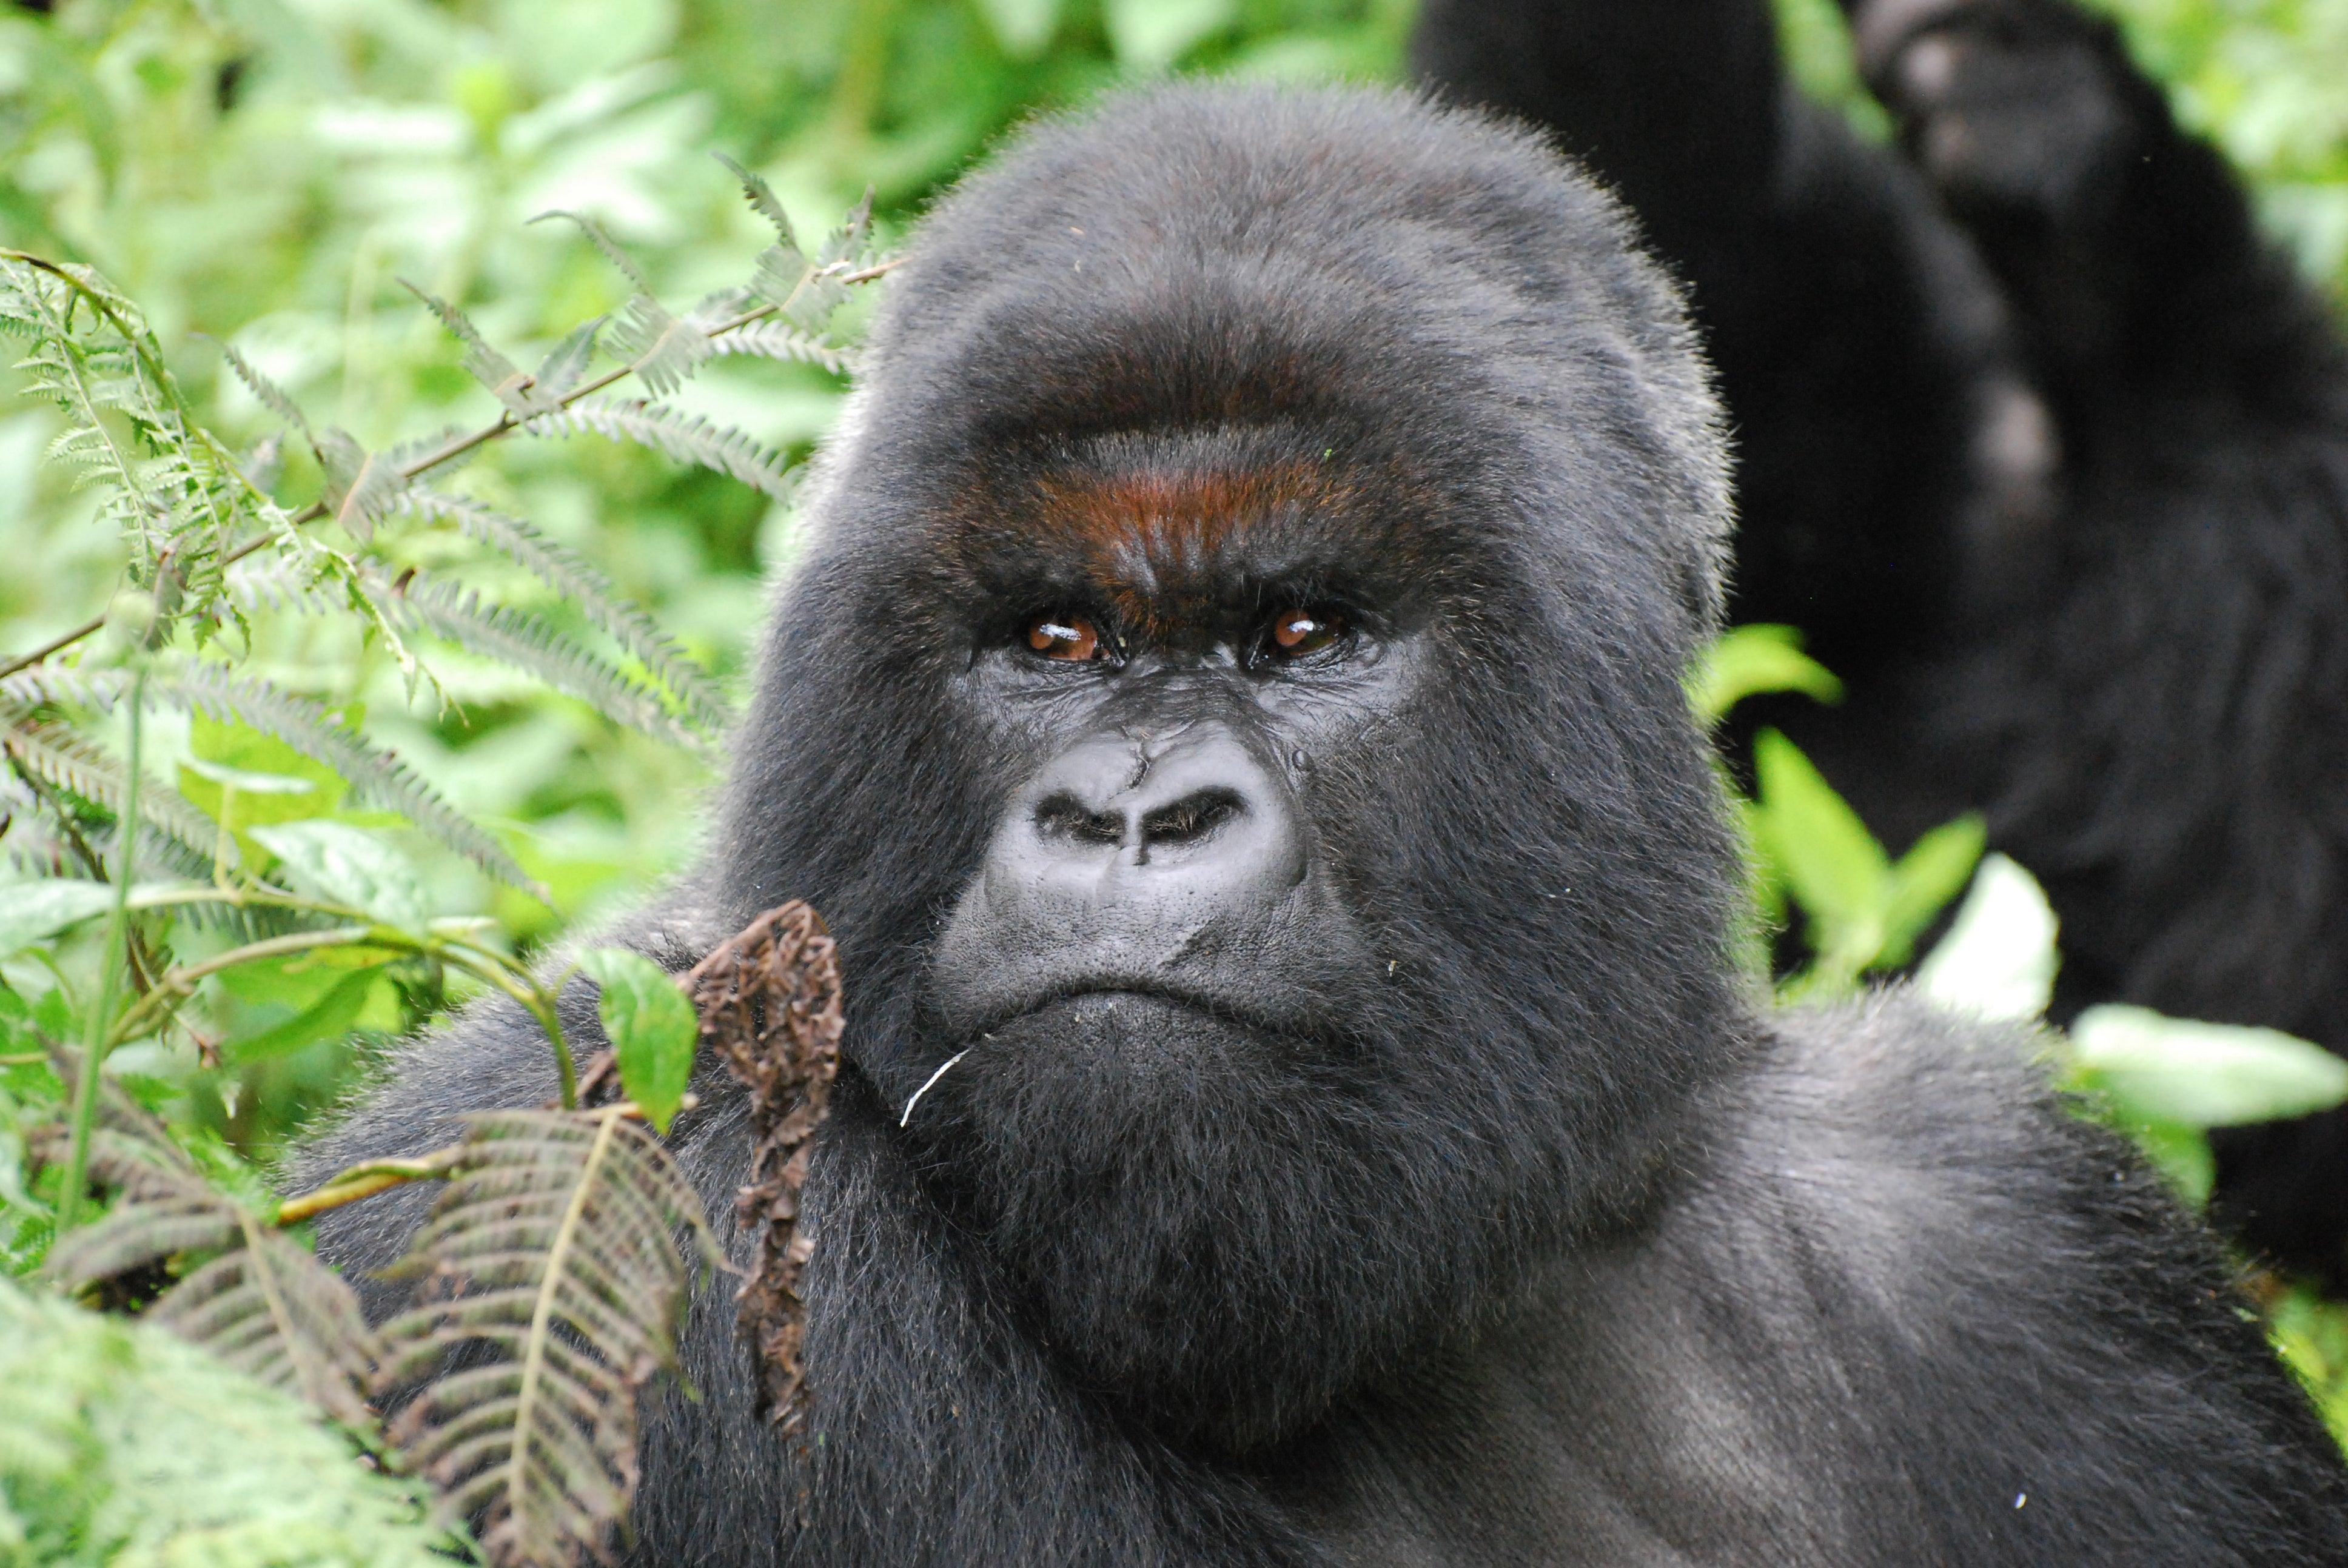 Real Gorilla Hand Ashtray Best Chimpanzee And Gorilla